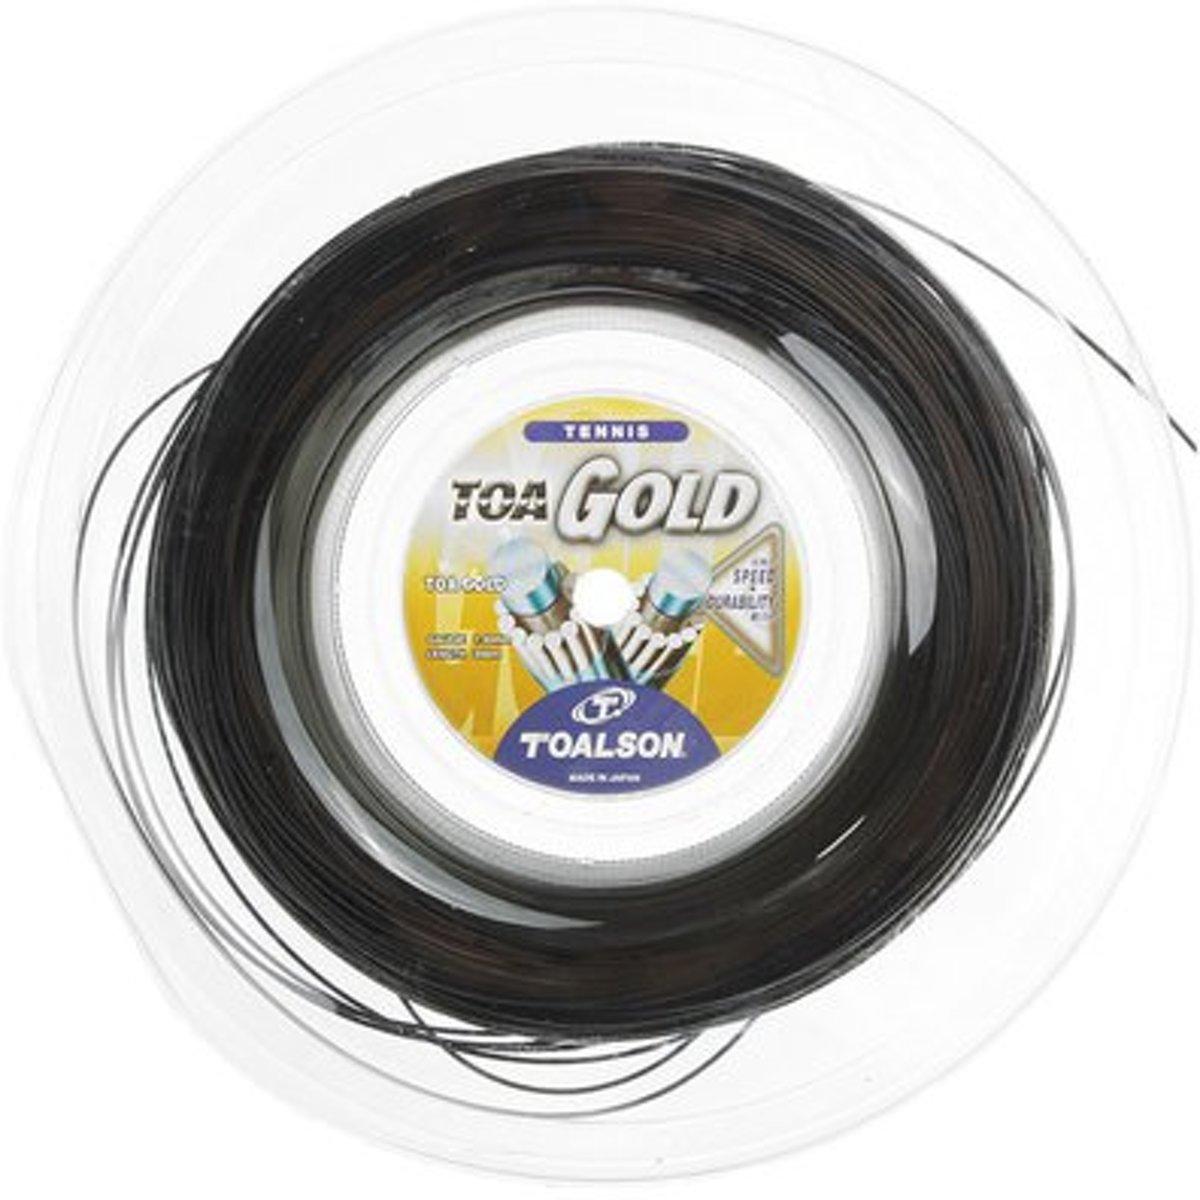 Toalson Toa Gold snaar 1.30 mm zwart kopen